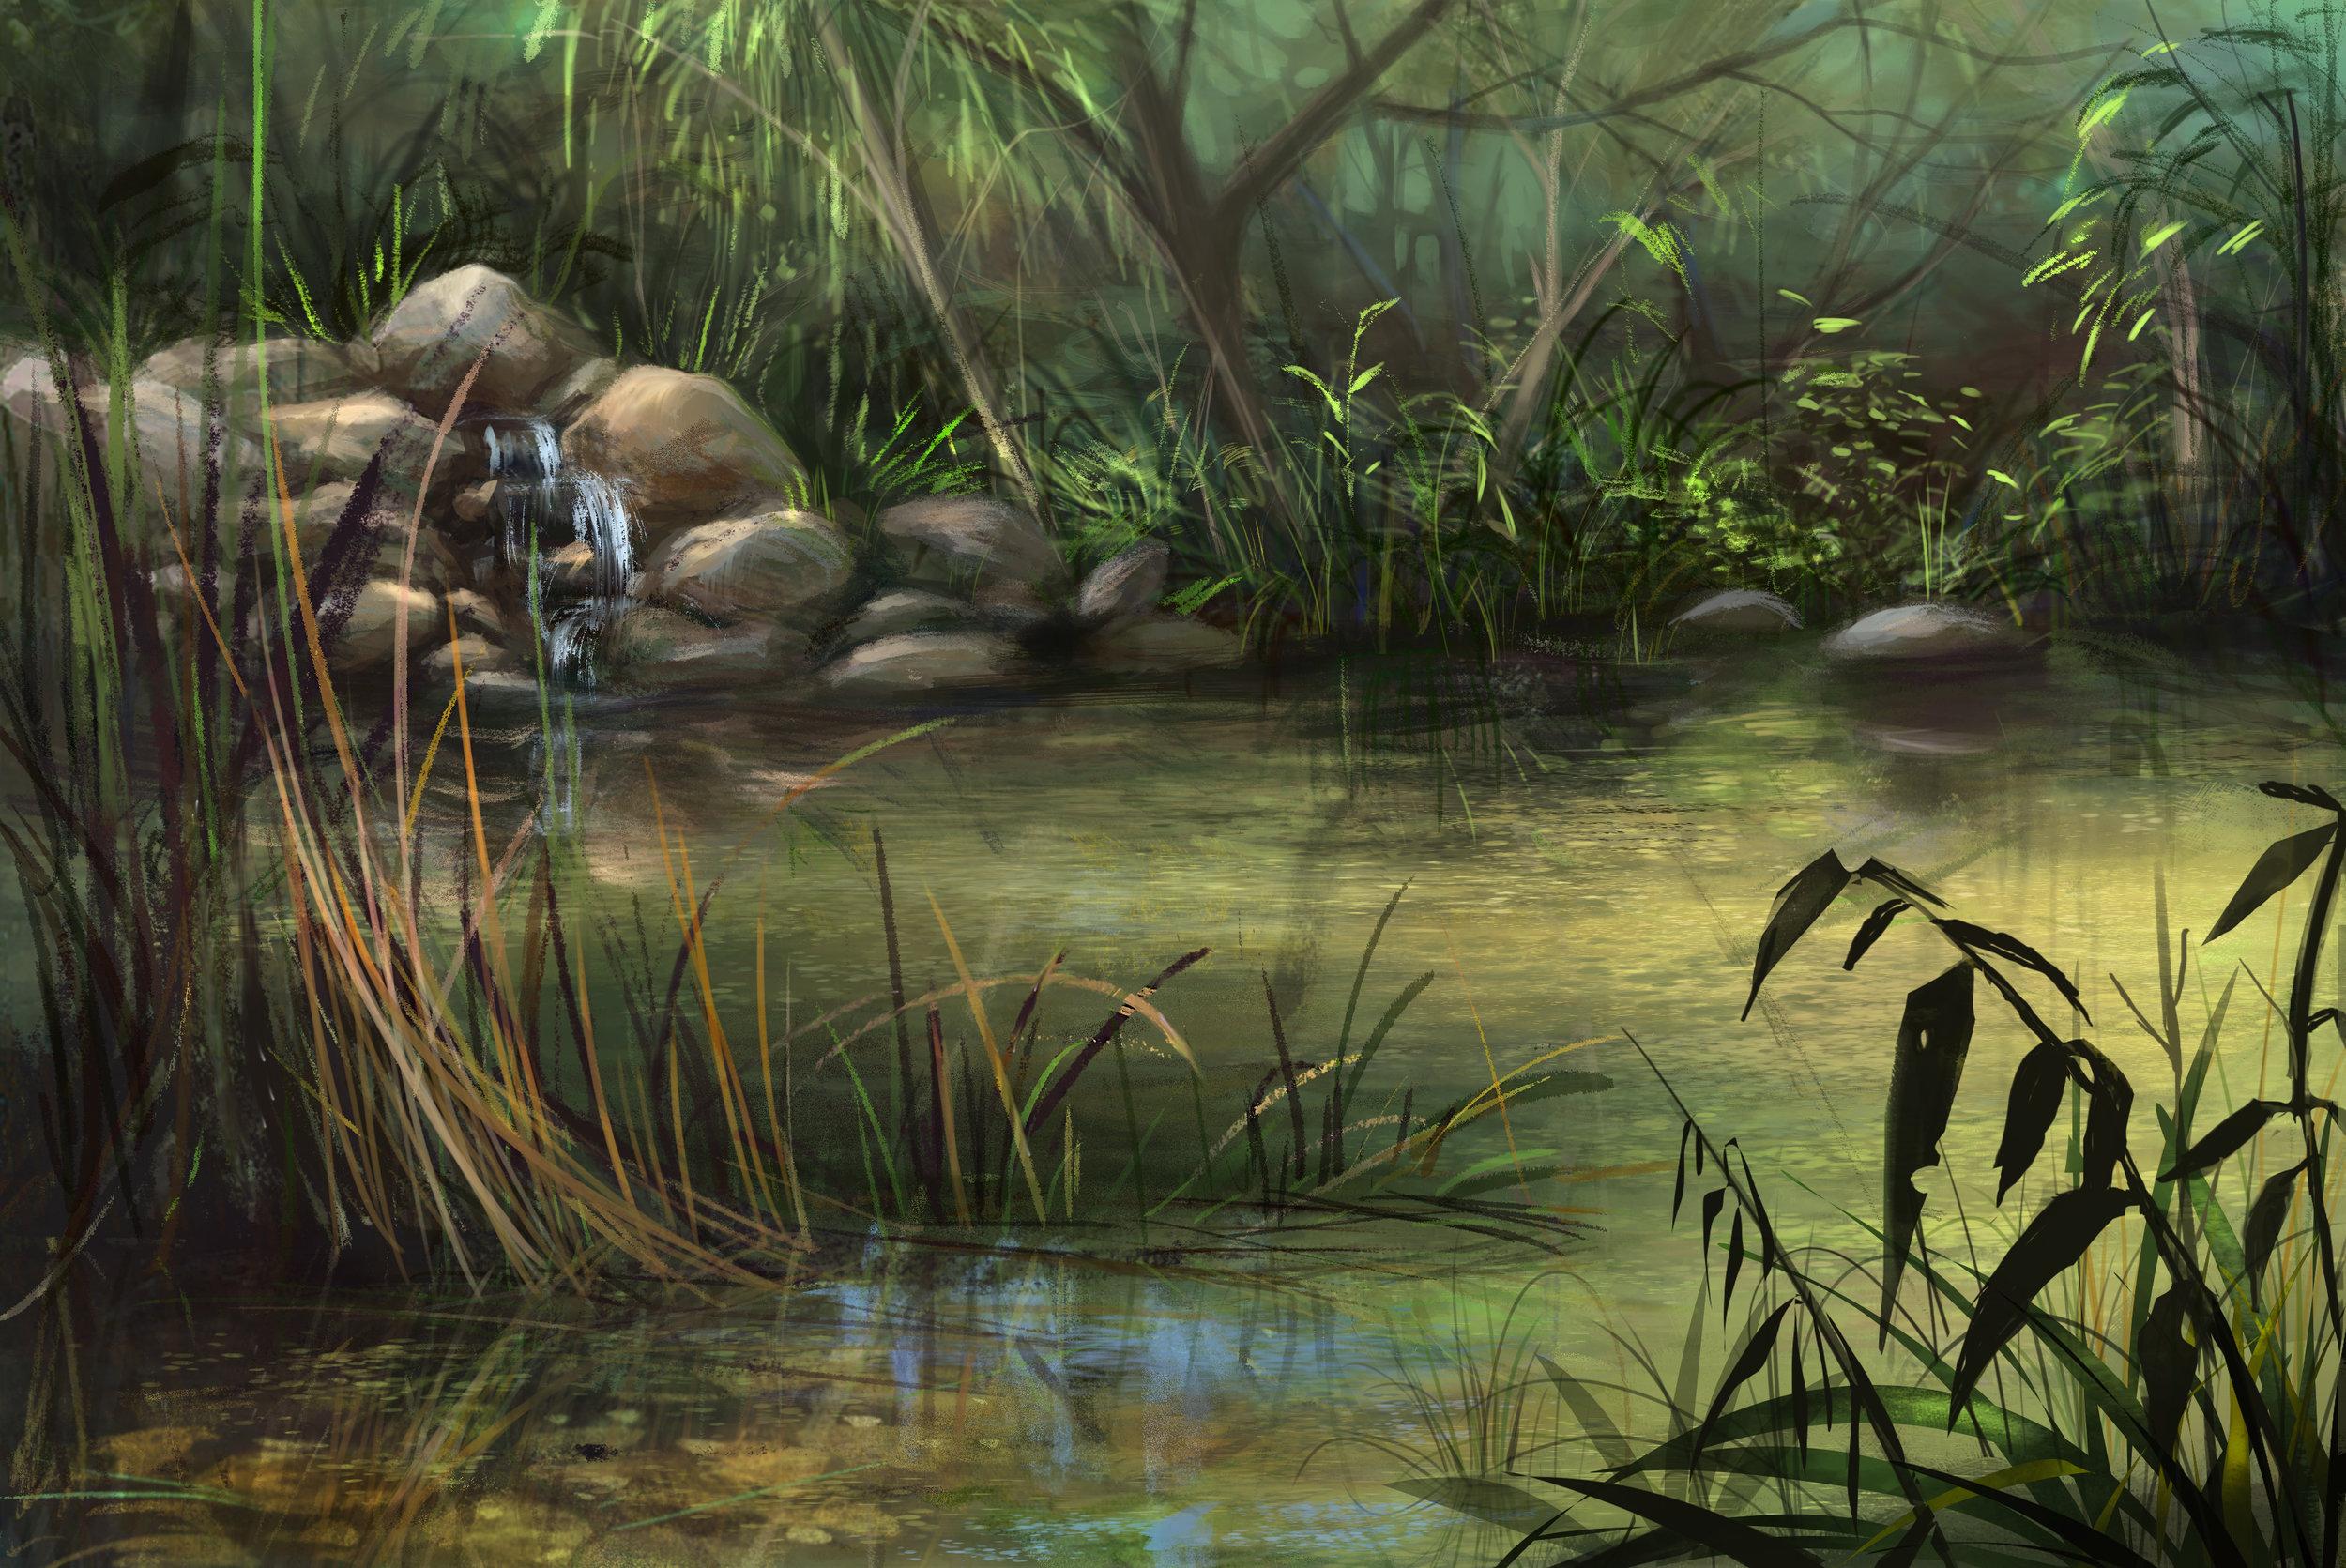 _yesenia_popova_term_5_dgitial_landscape_spring16_yeseniapopova@gmail.com_0240045 _ copy.jpg